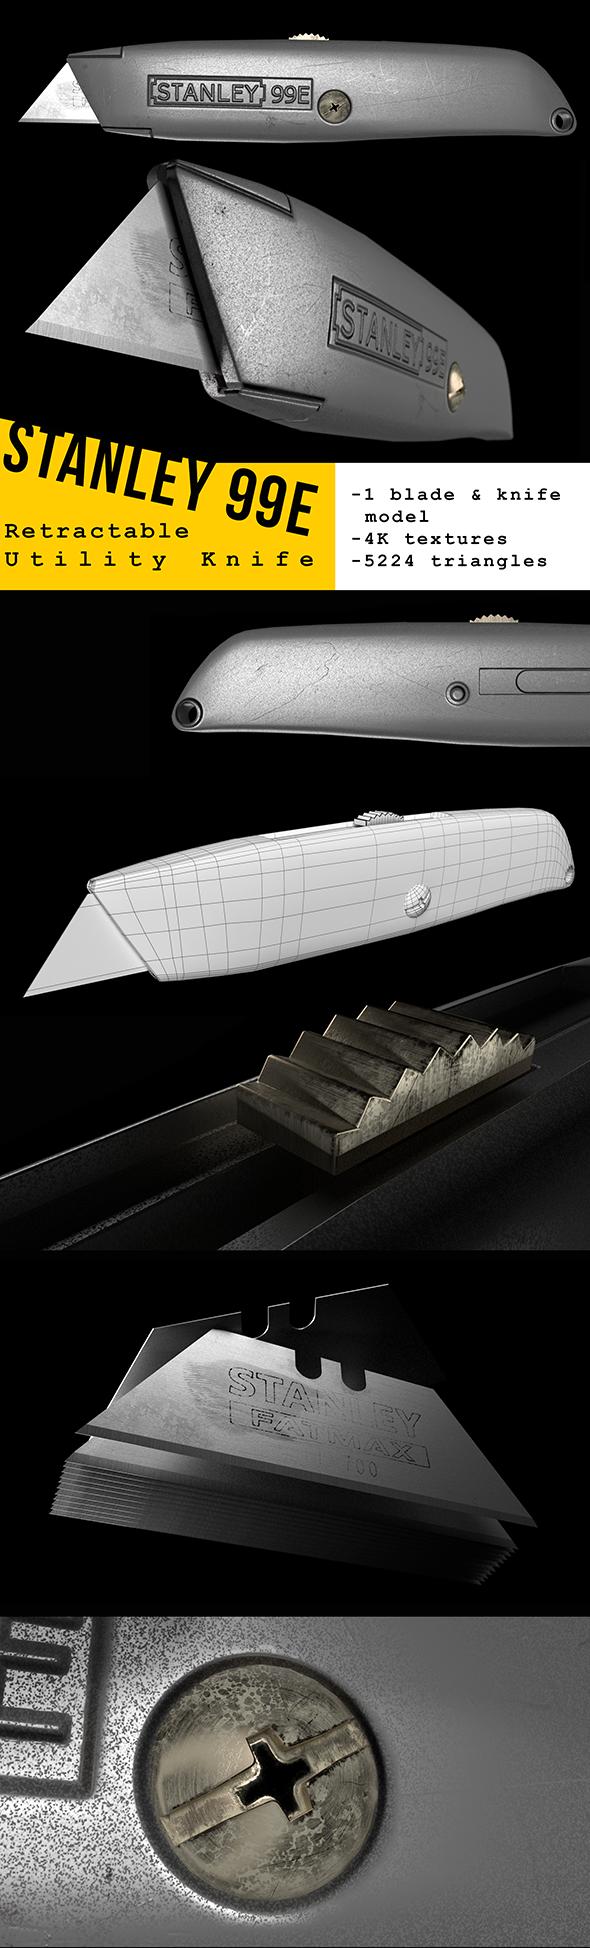 Stanley 99E Utility Knife 3D Model - 3DOcean Item for Sale